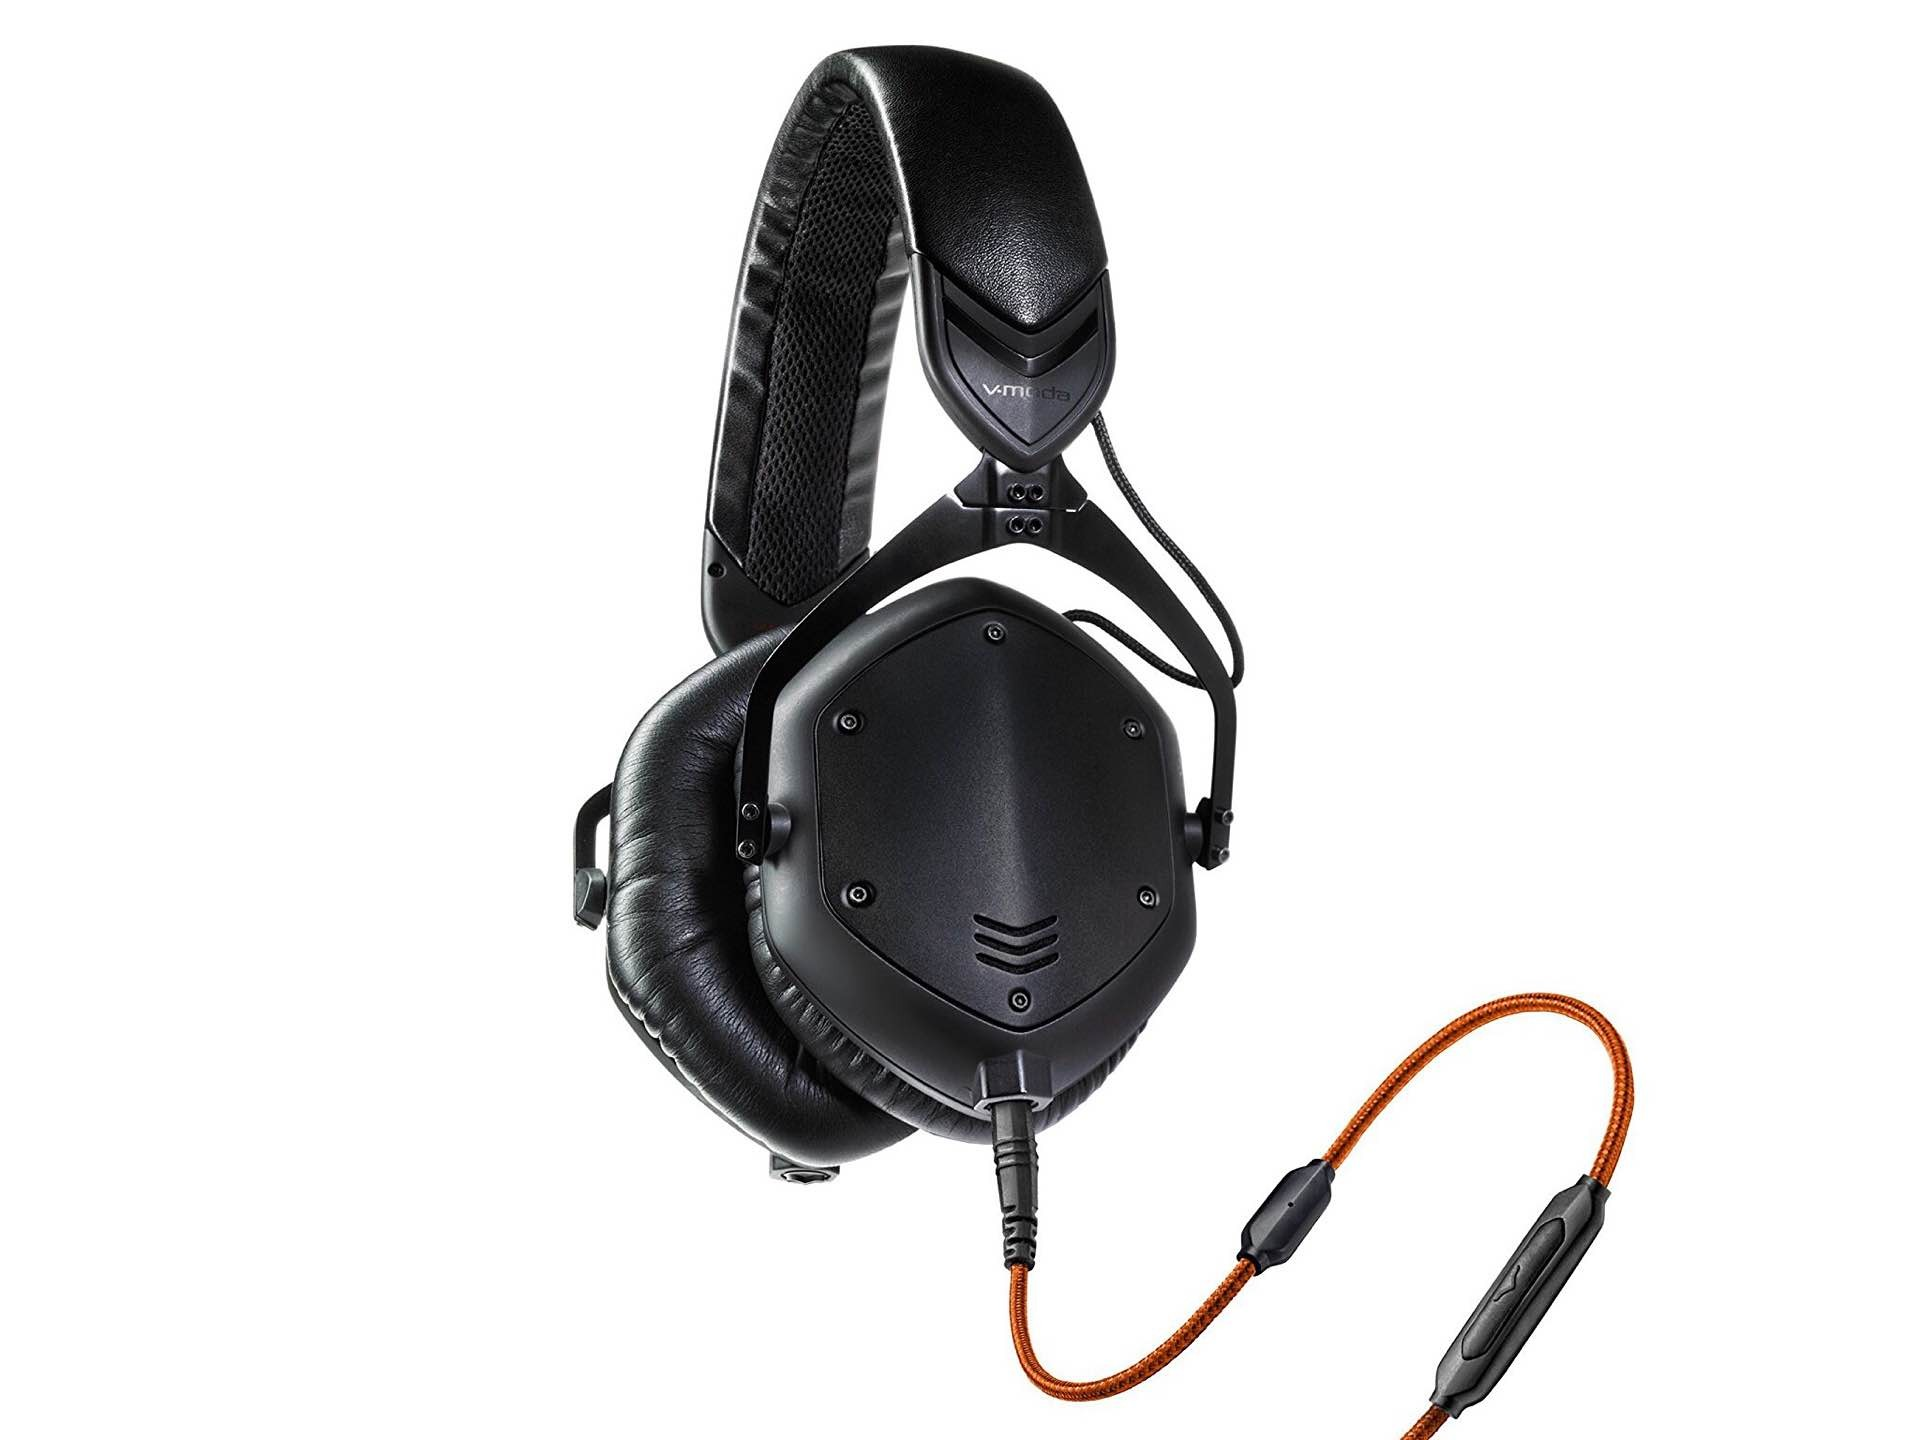 V-Moda Crossfade M-100 noise-isolating headphones. ($249)